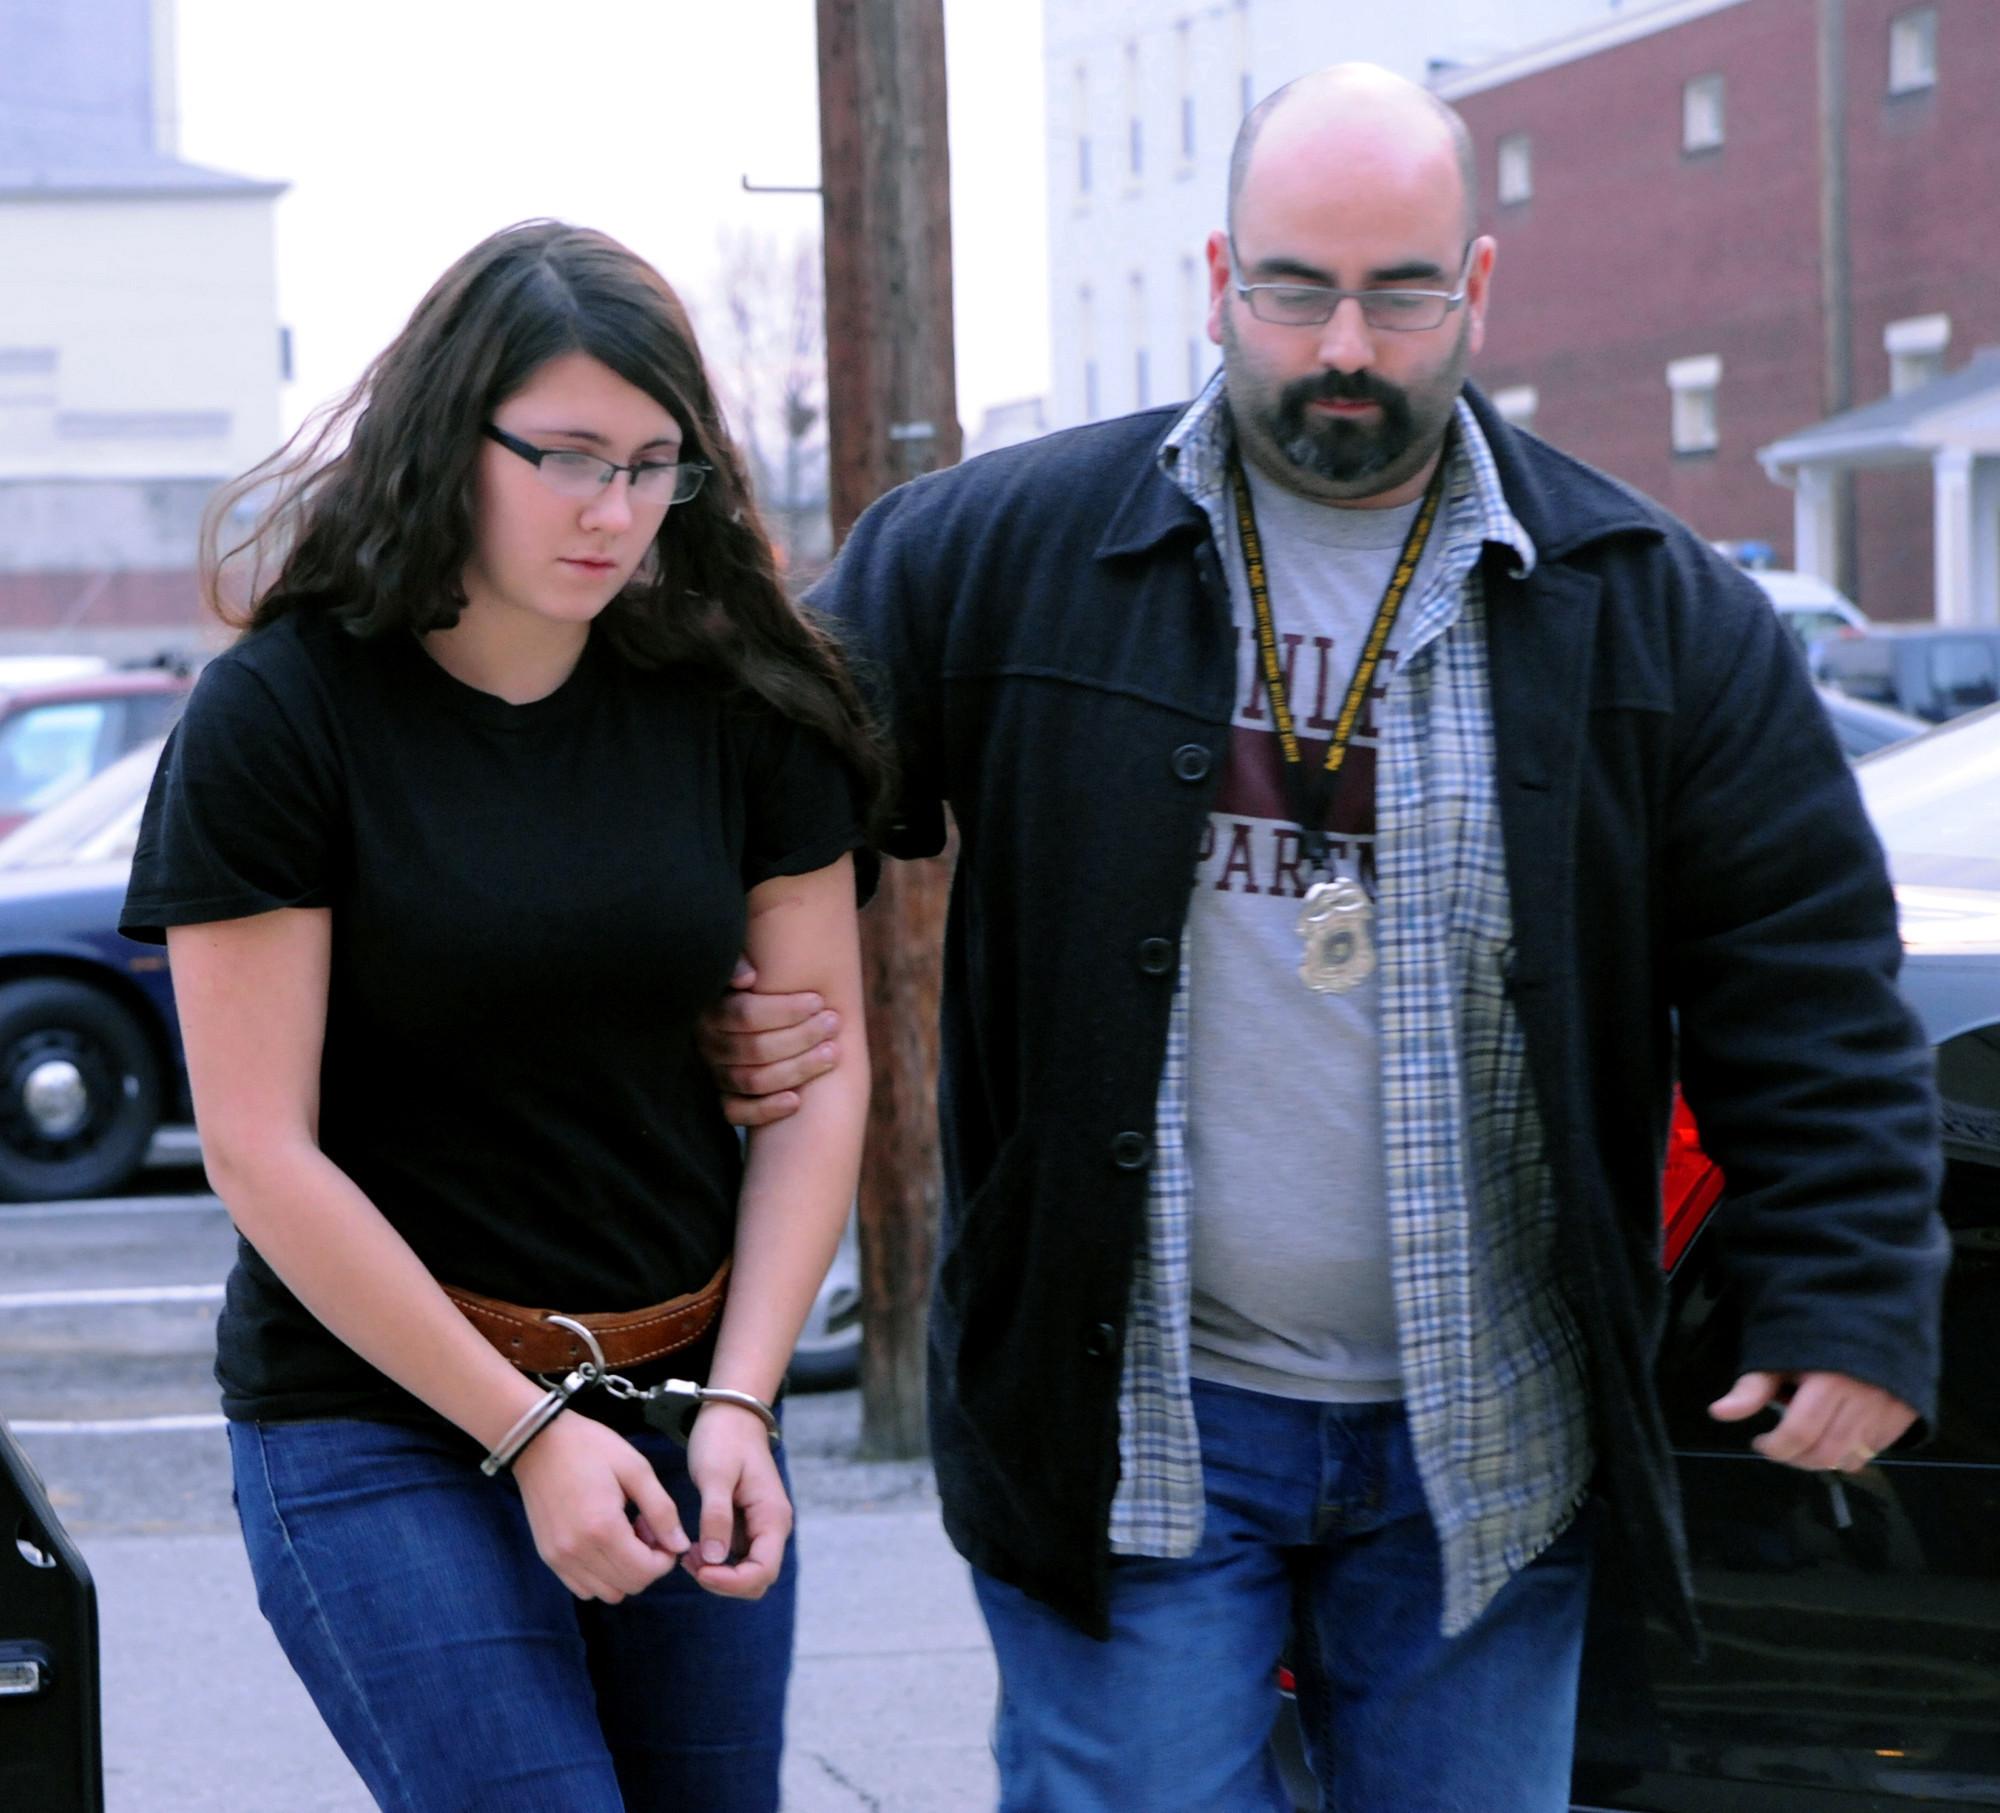 york craigslist. lapd looking into craigslist killing suspect\u0027s claim of local victim - la times york m